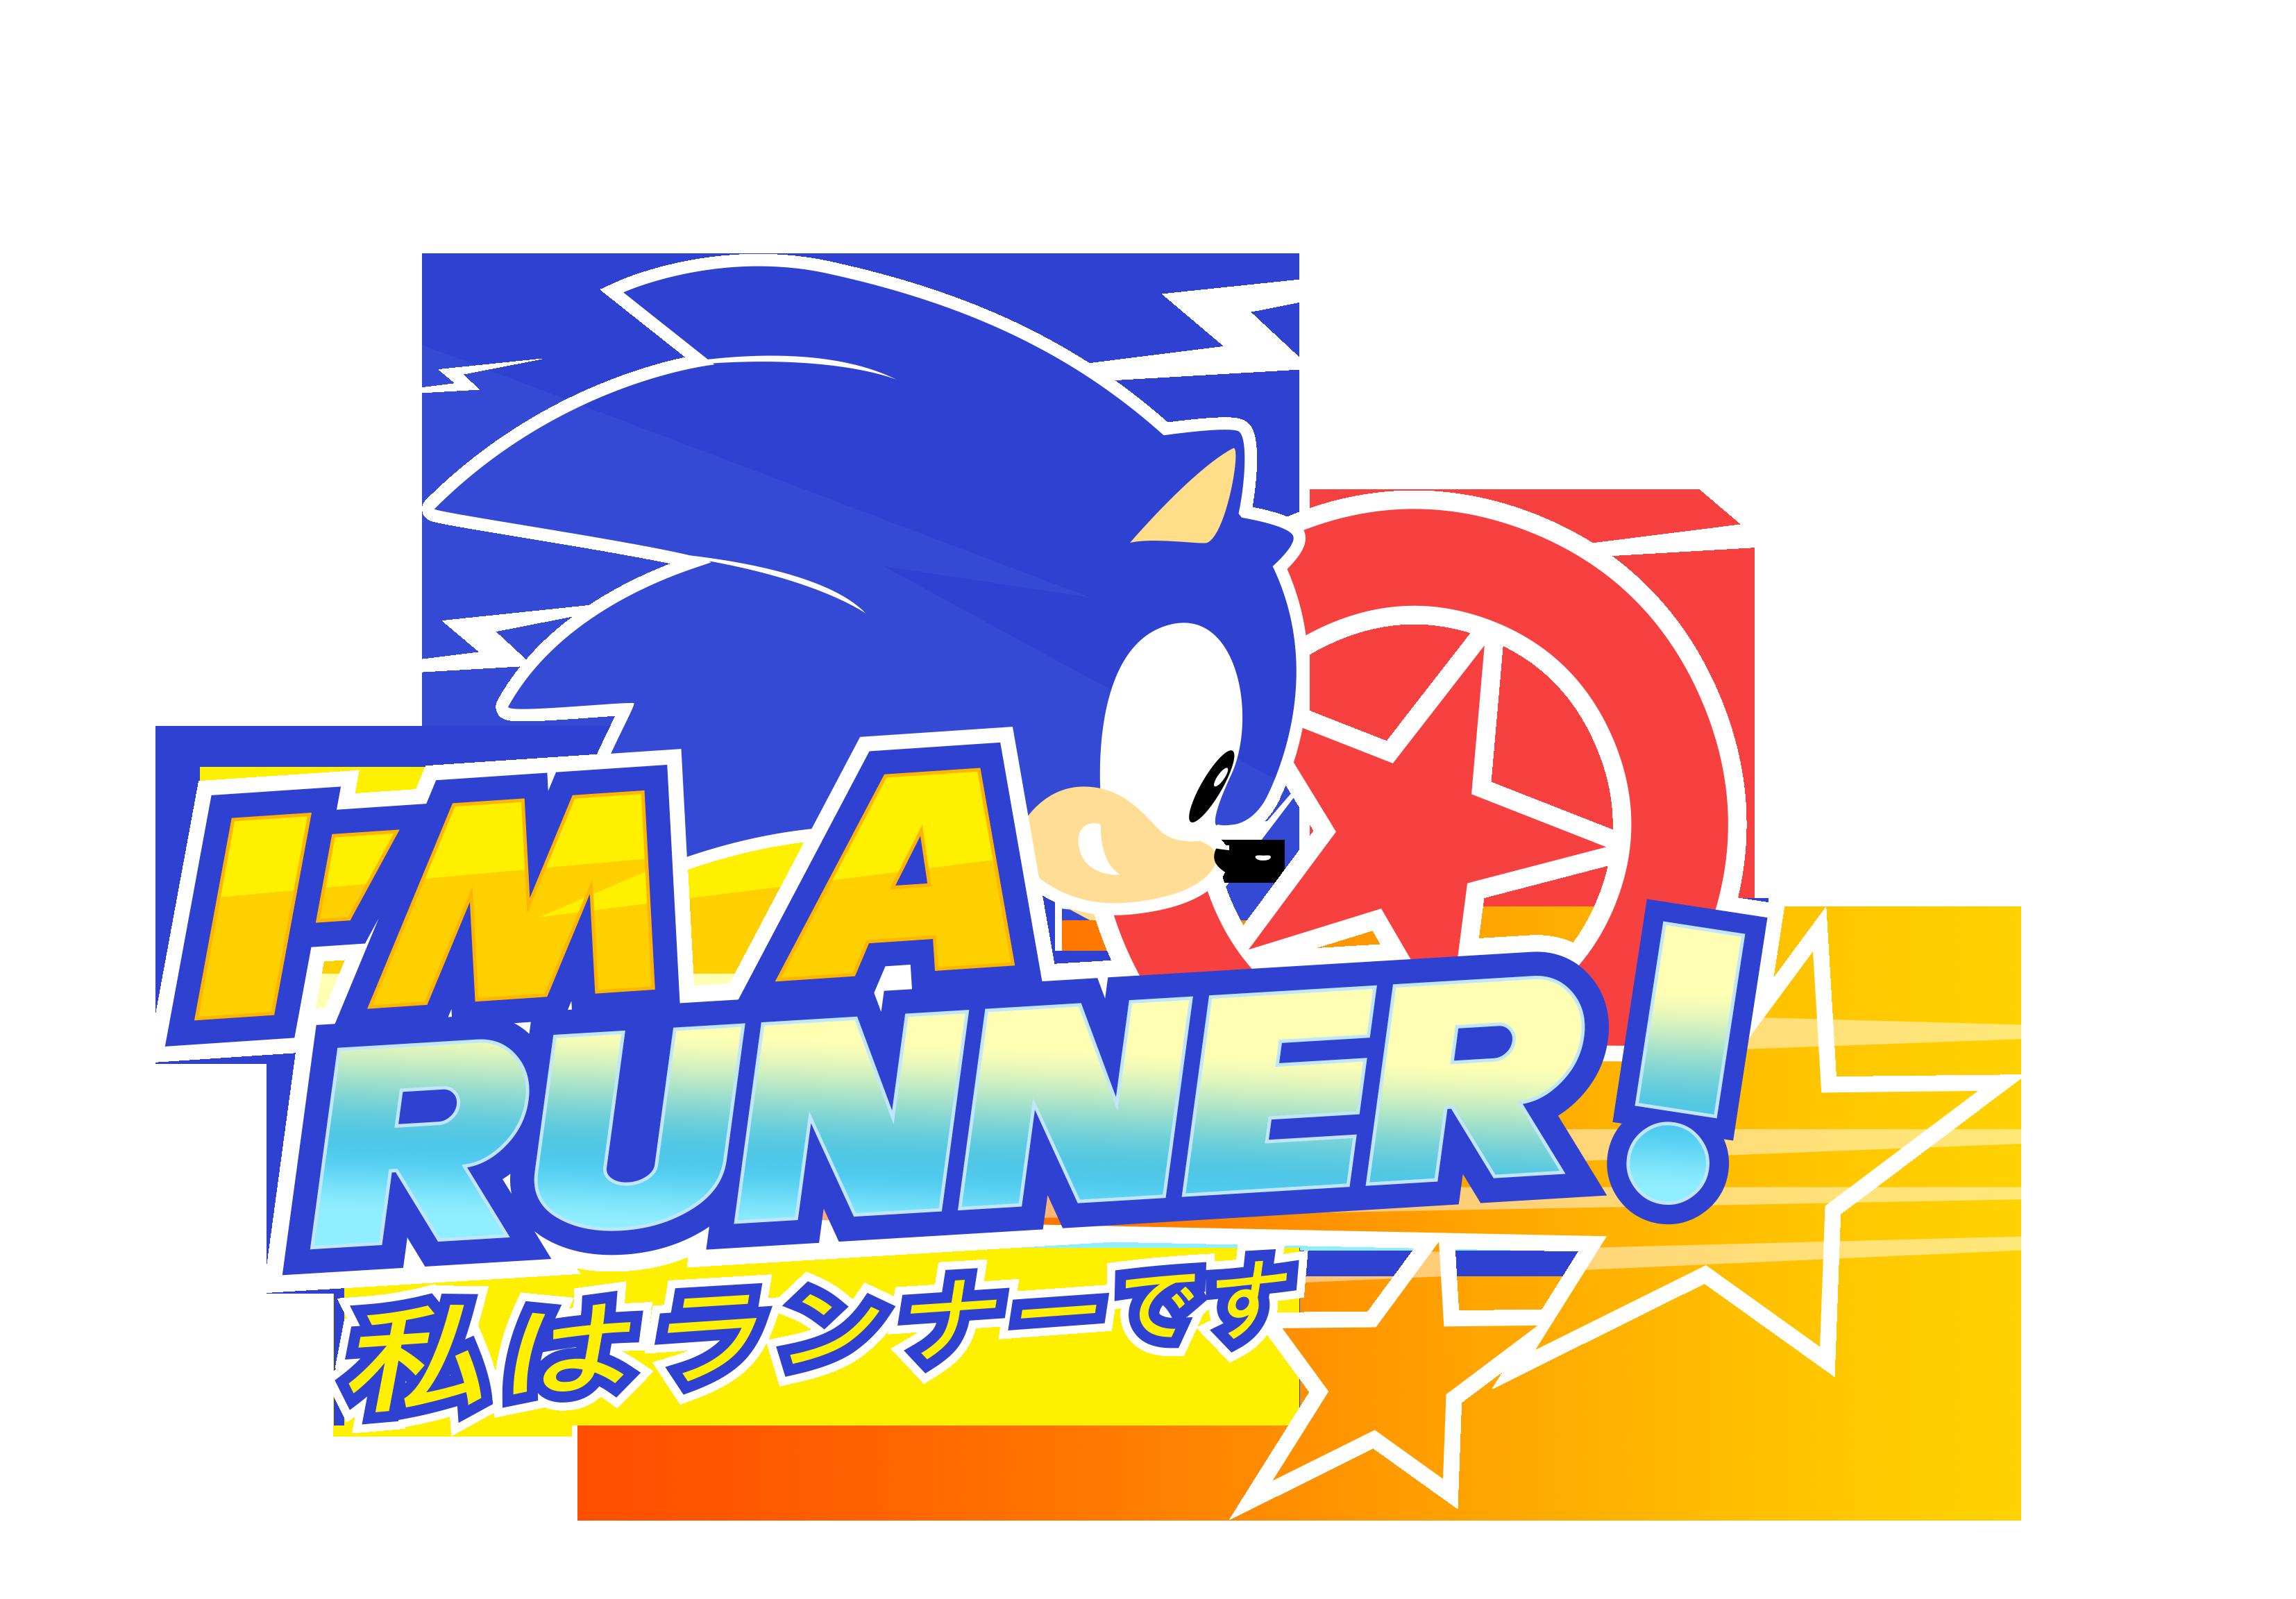 I'm a runner! Logo by NuryRush